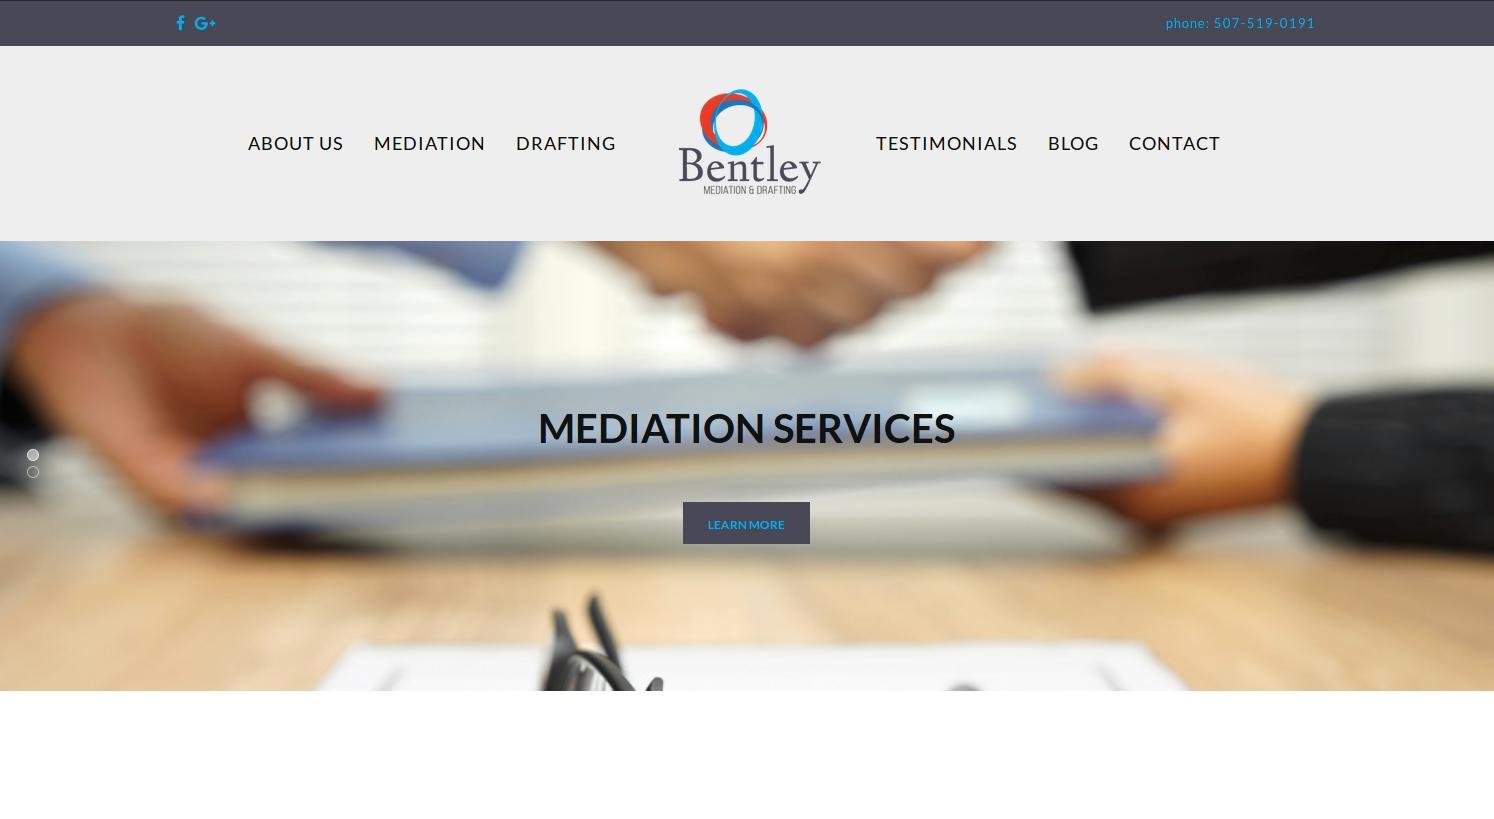 Bentley Mediation & Drafting